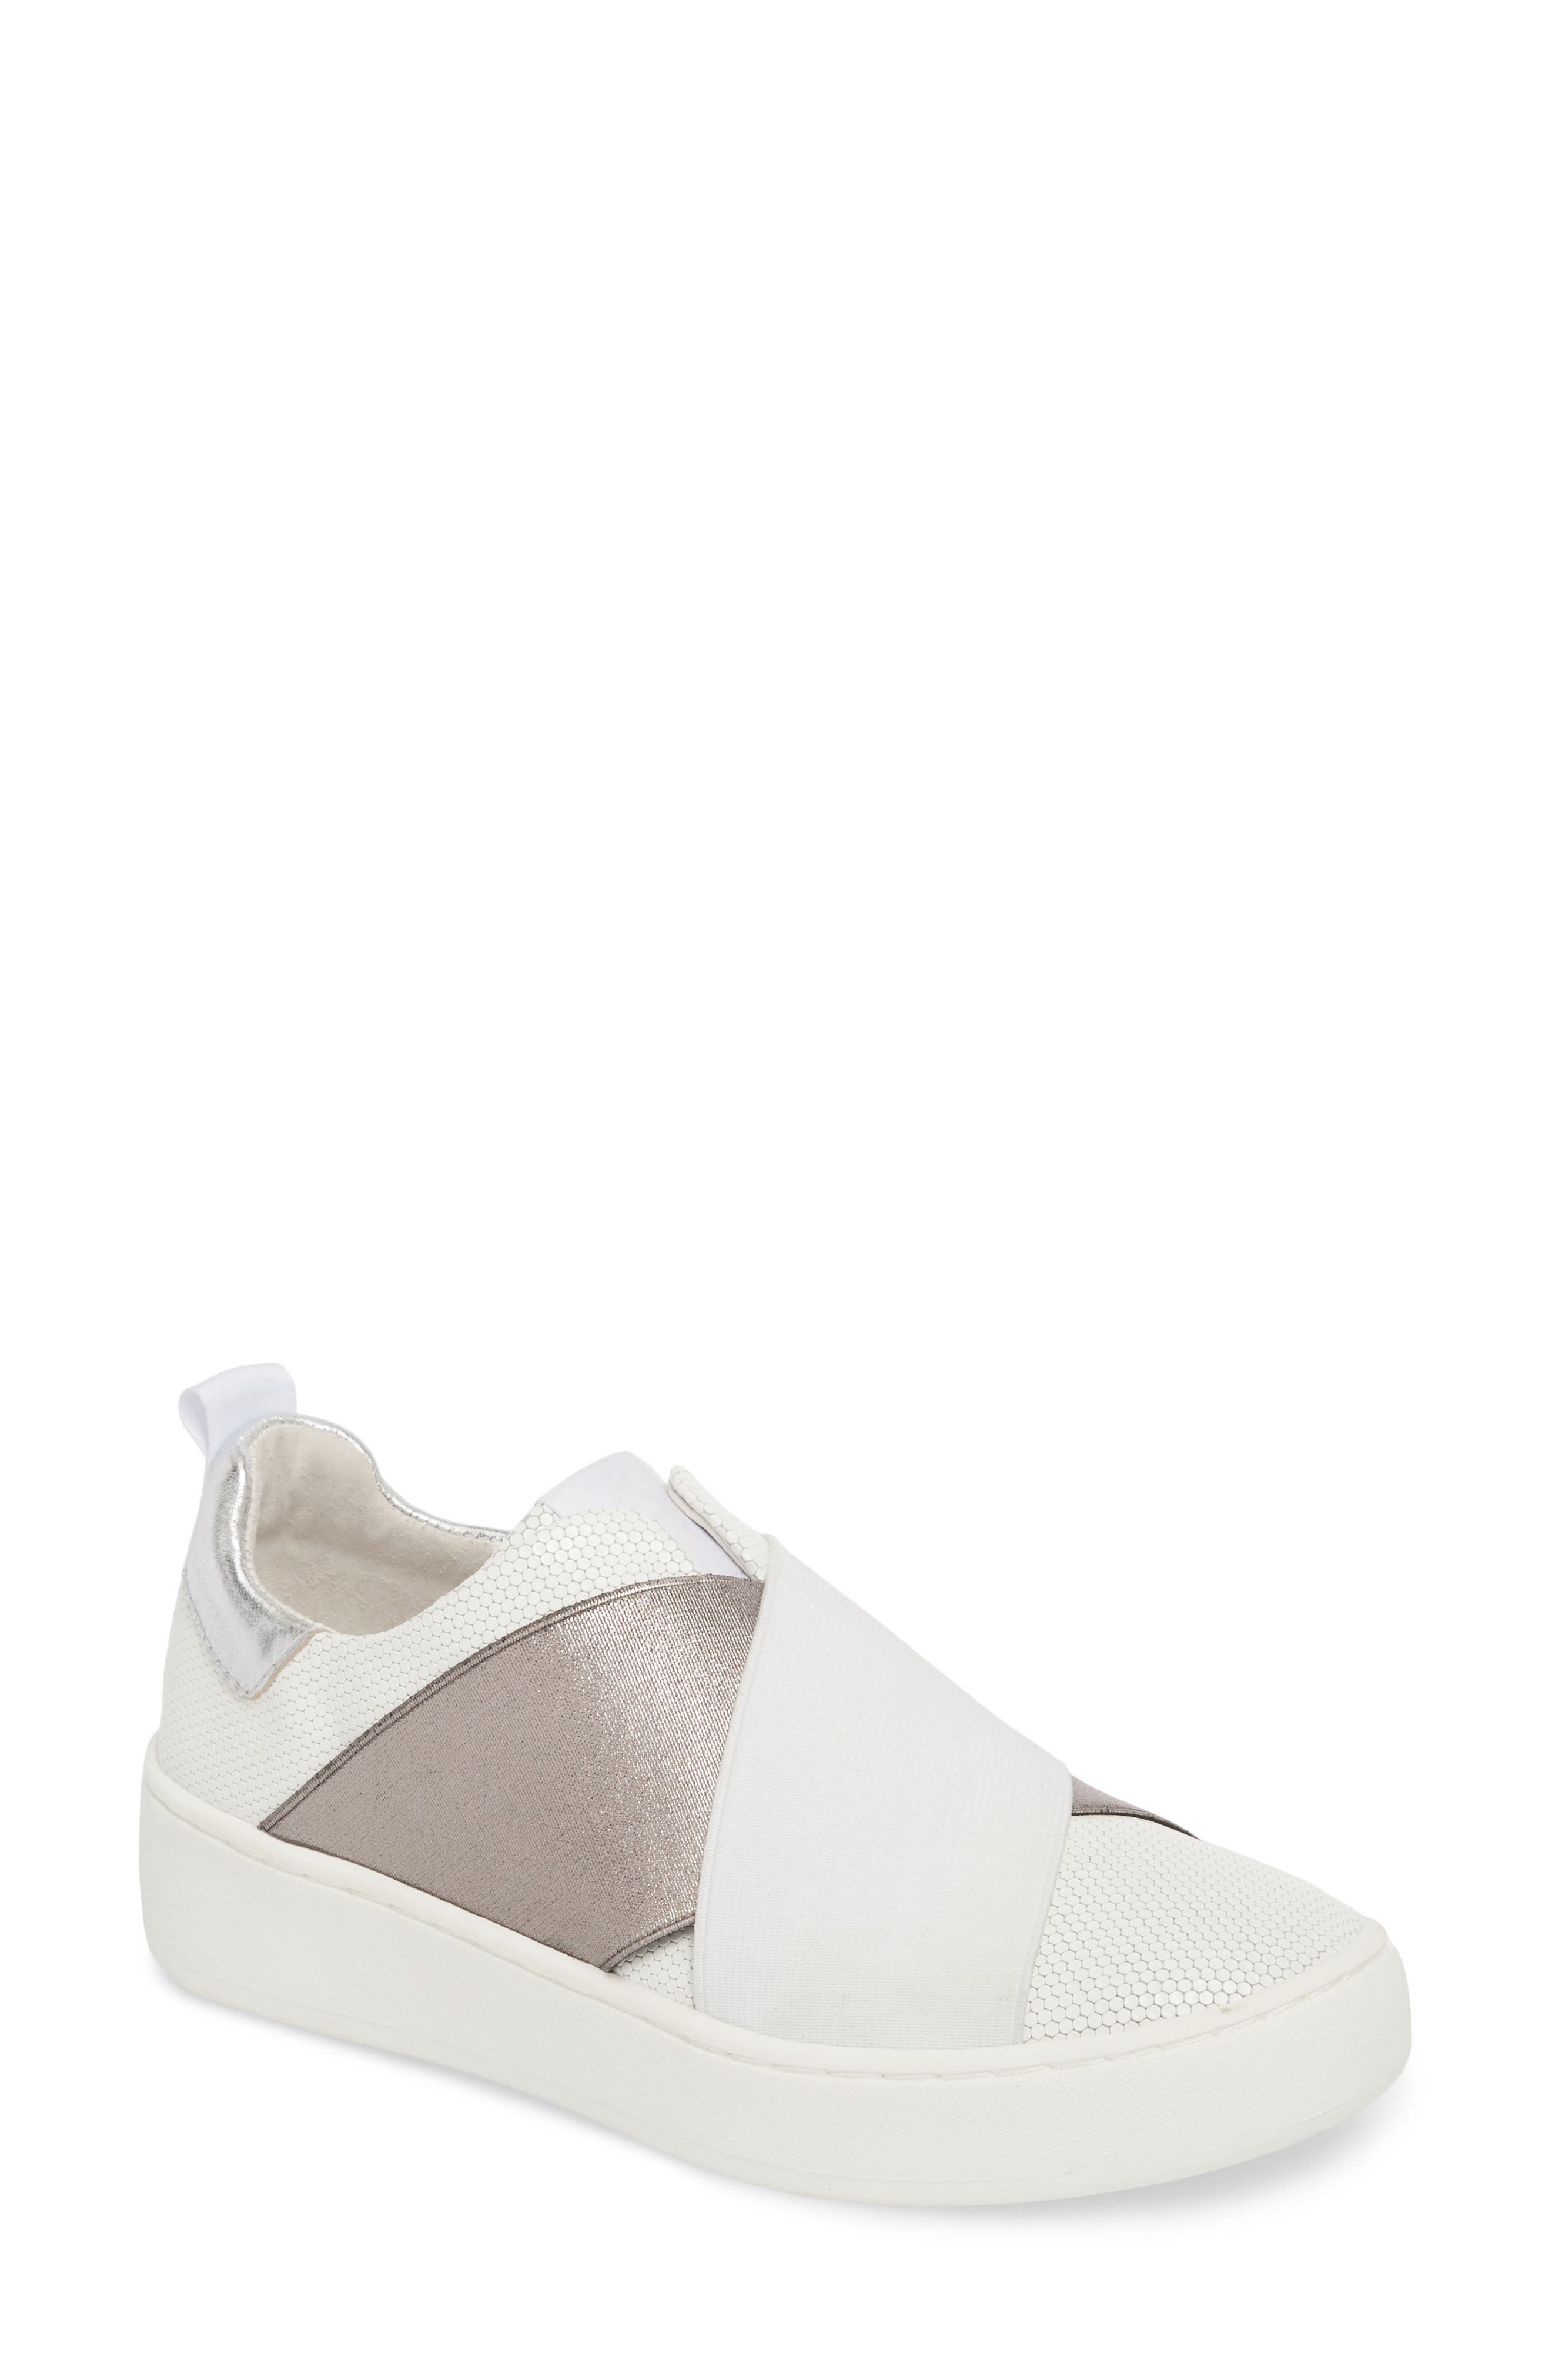 Donald Pliner Women's Coley Platform Slip-On Sneaker oSyFCN